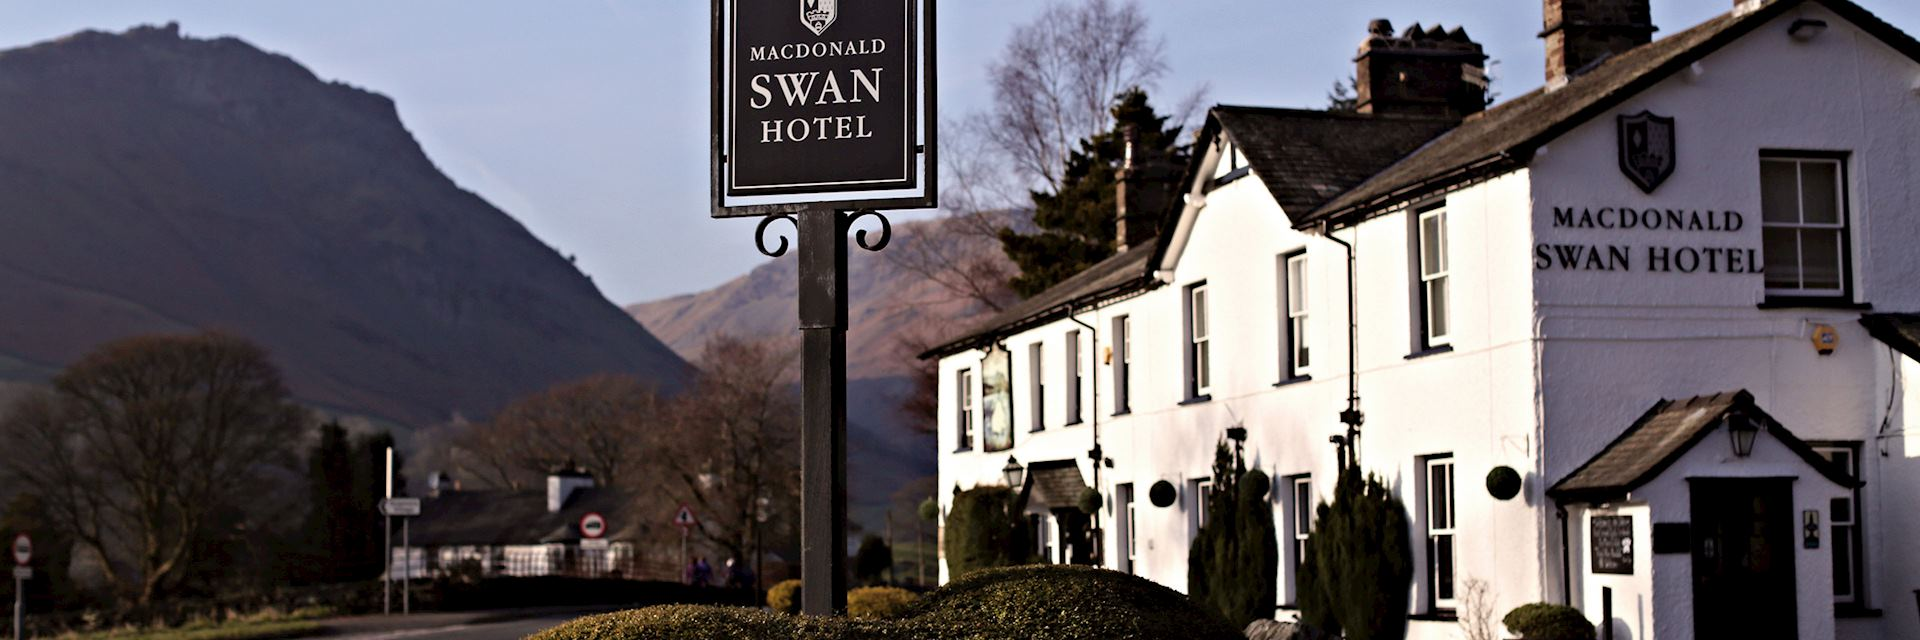 Macdonald Swan Hotel, the Lake District